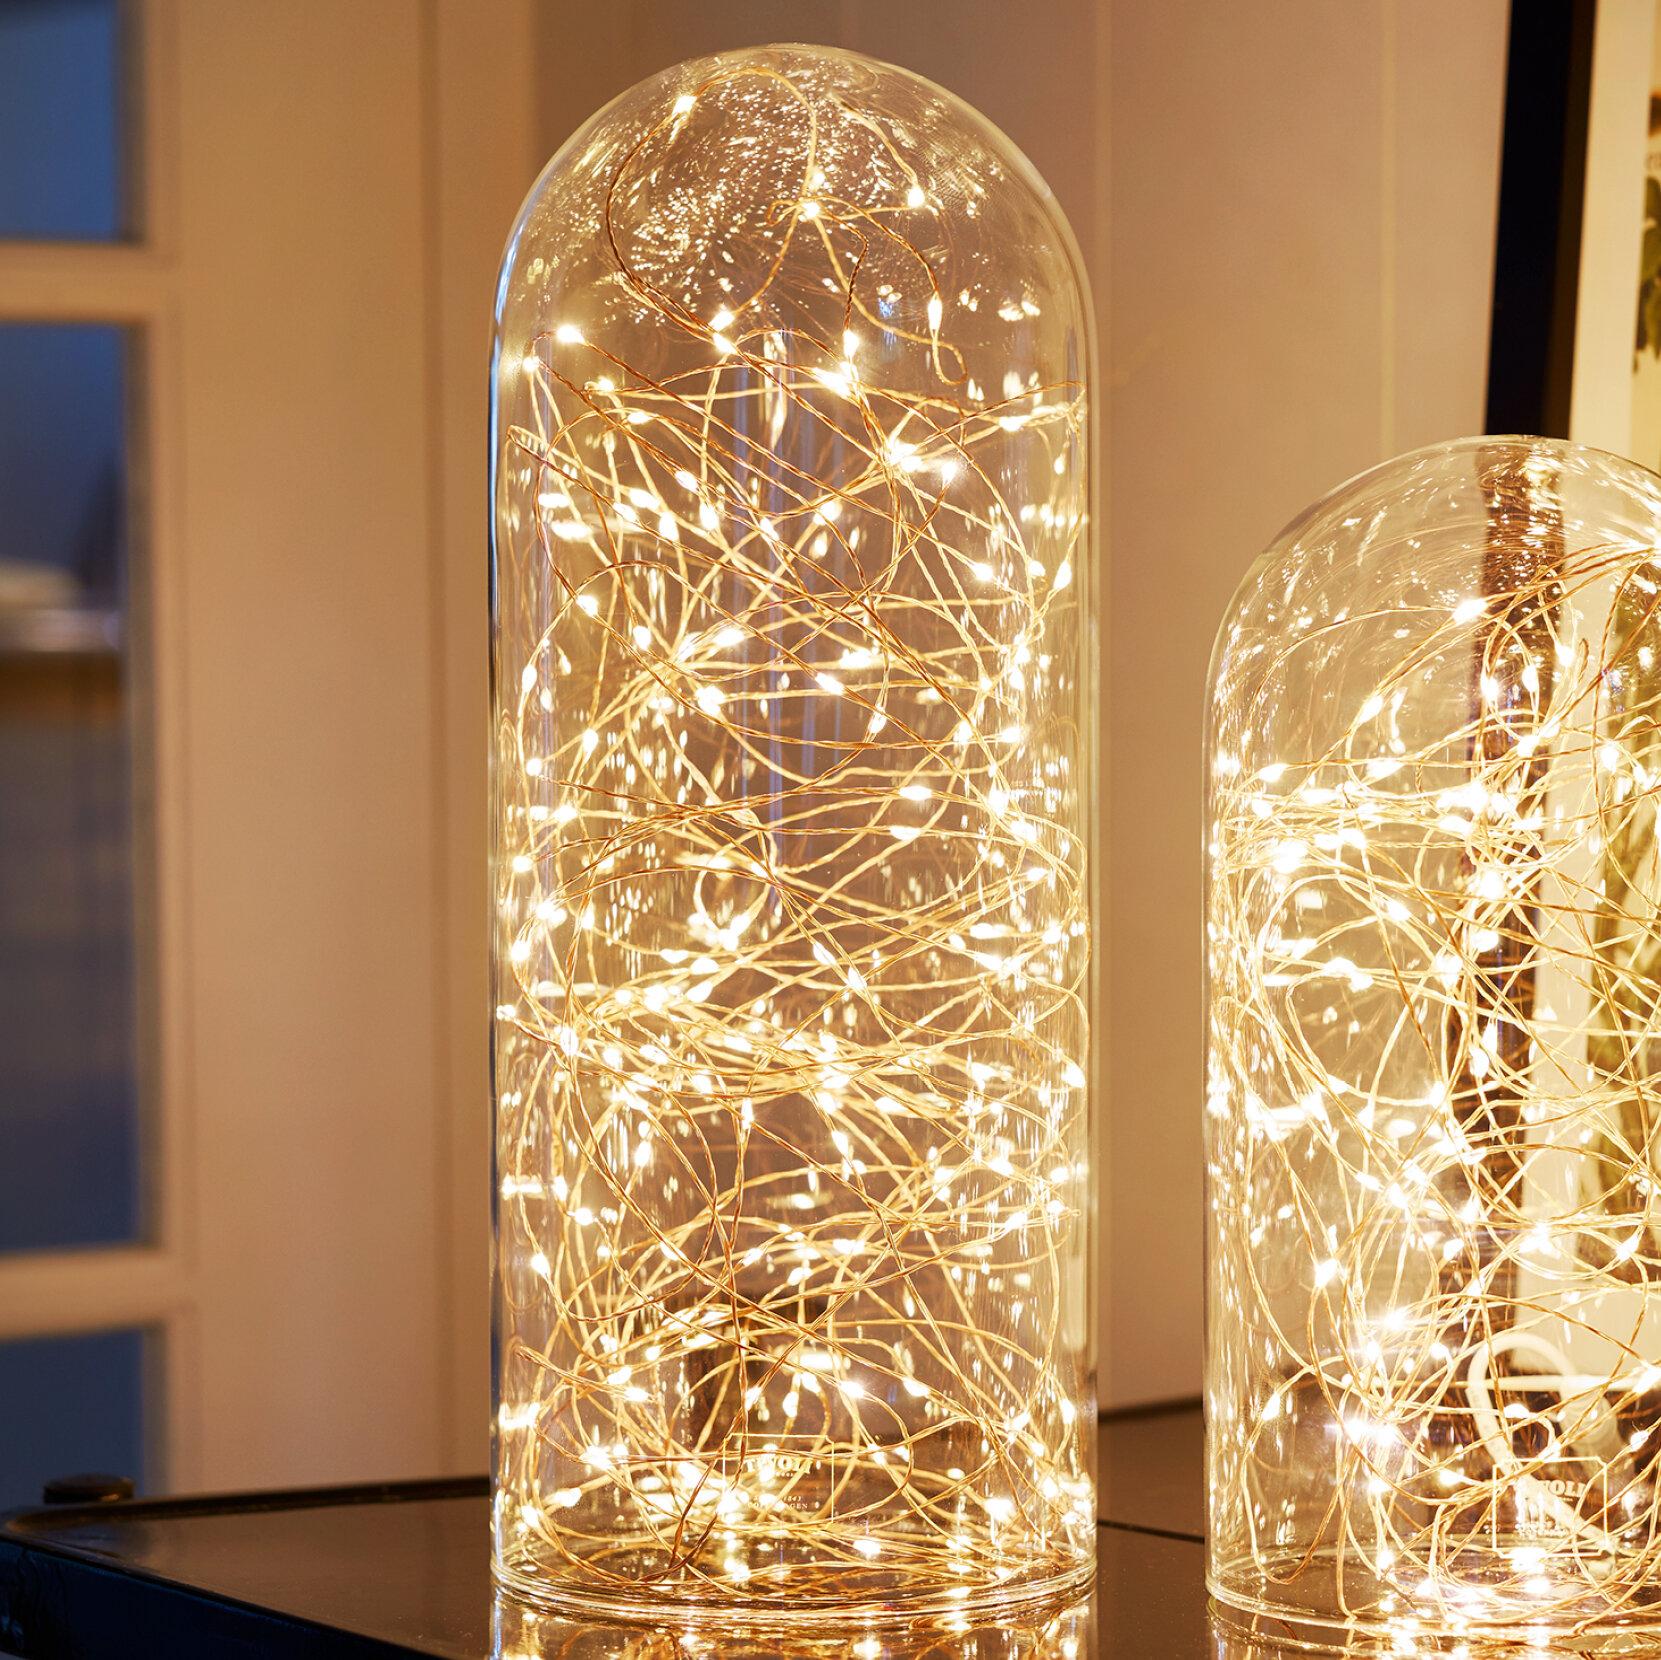 Tivoli Cloche By Lights